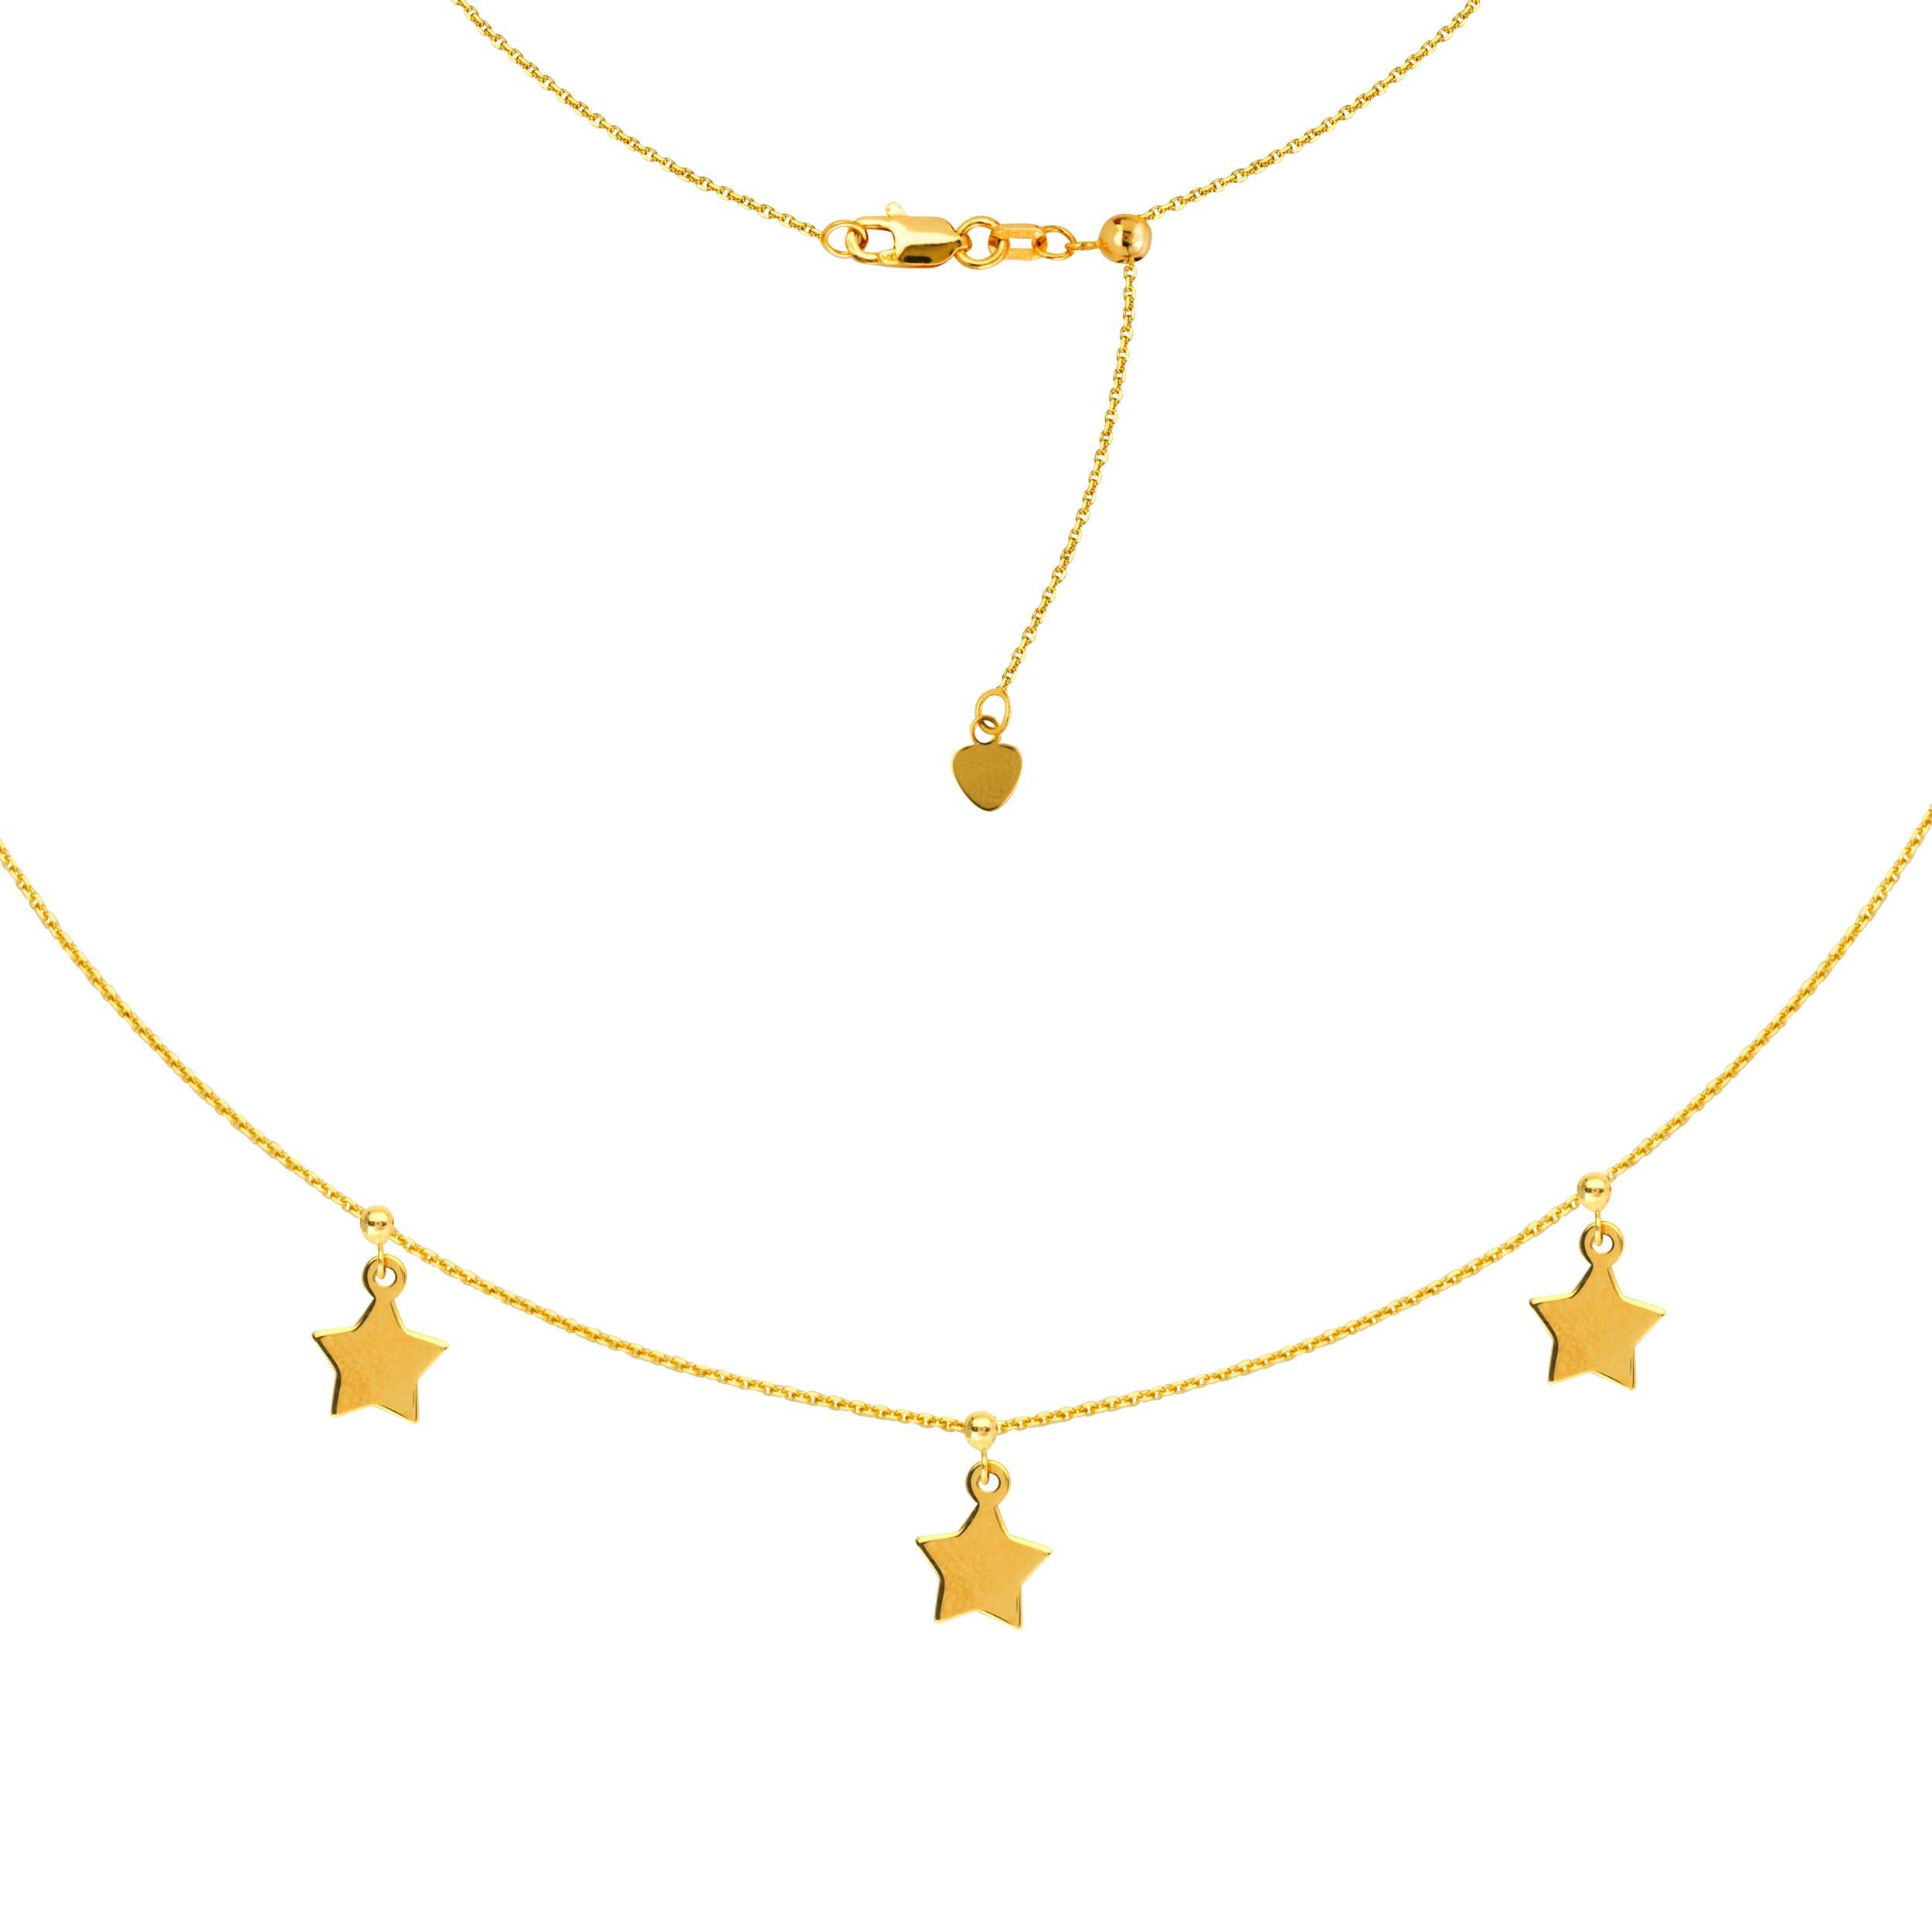 Ladies Triple Star Adjustable Choker Fashion Necklace 16